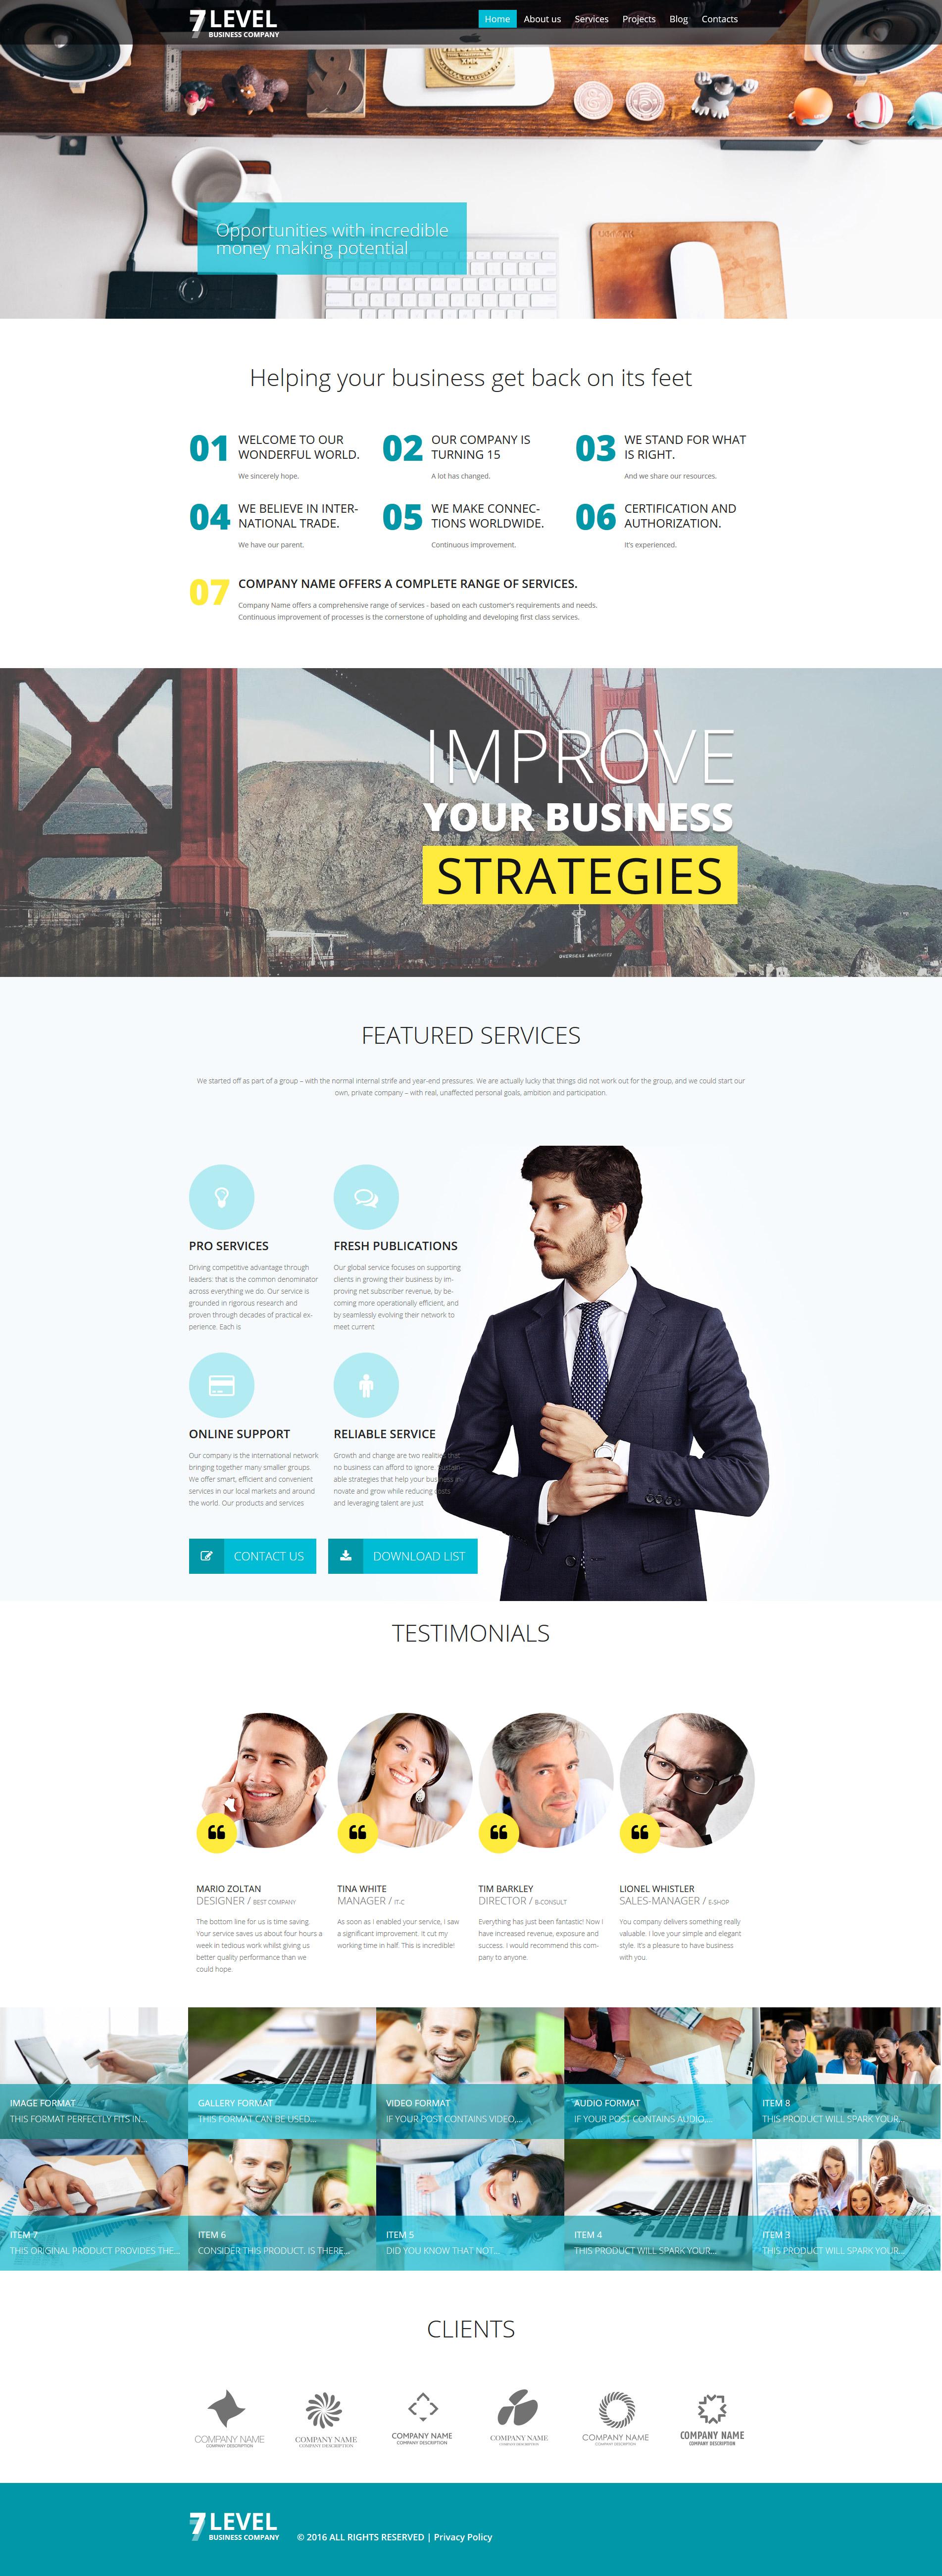 7 Level WordPress Theme - screenshot